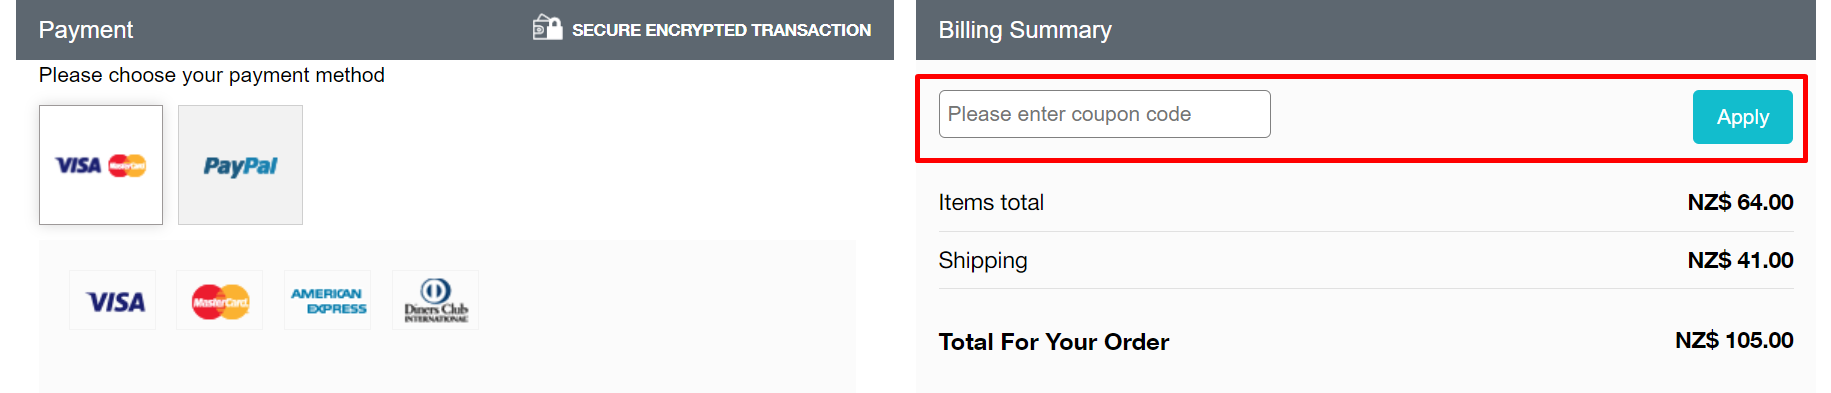 How do I use my The Detox Market coupon code?